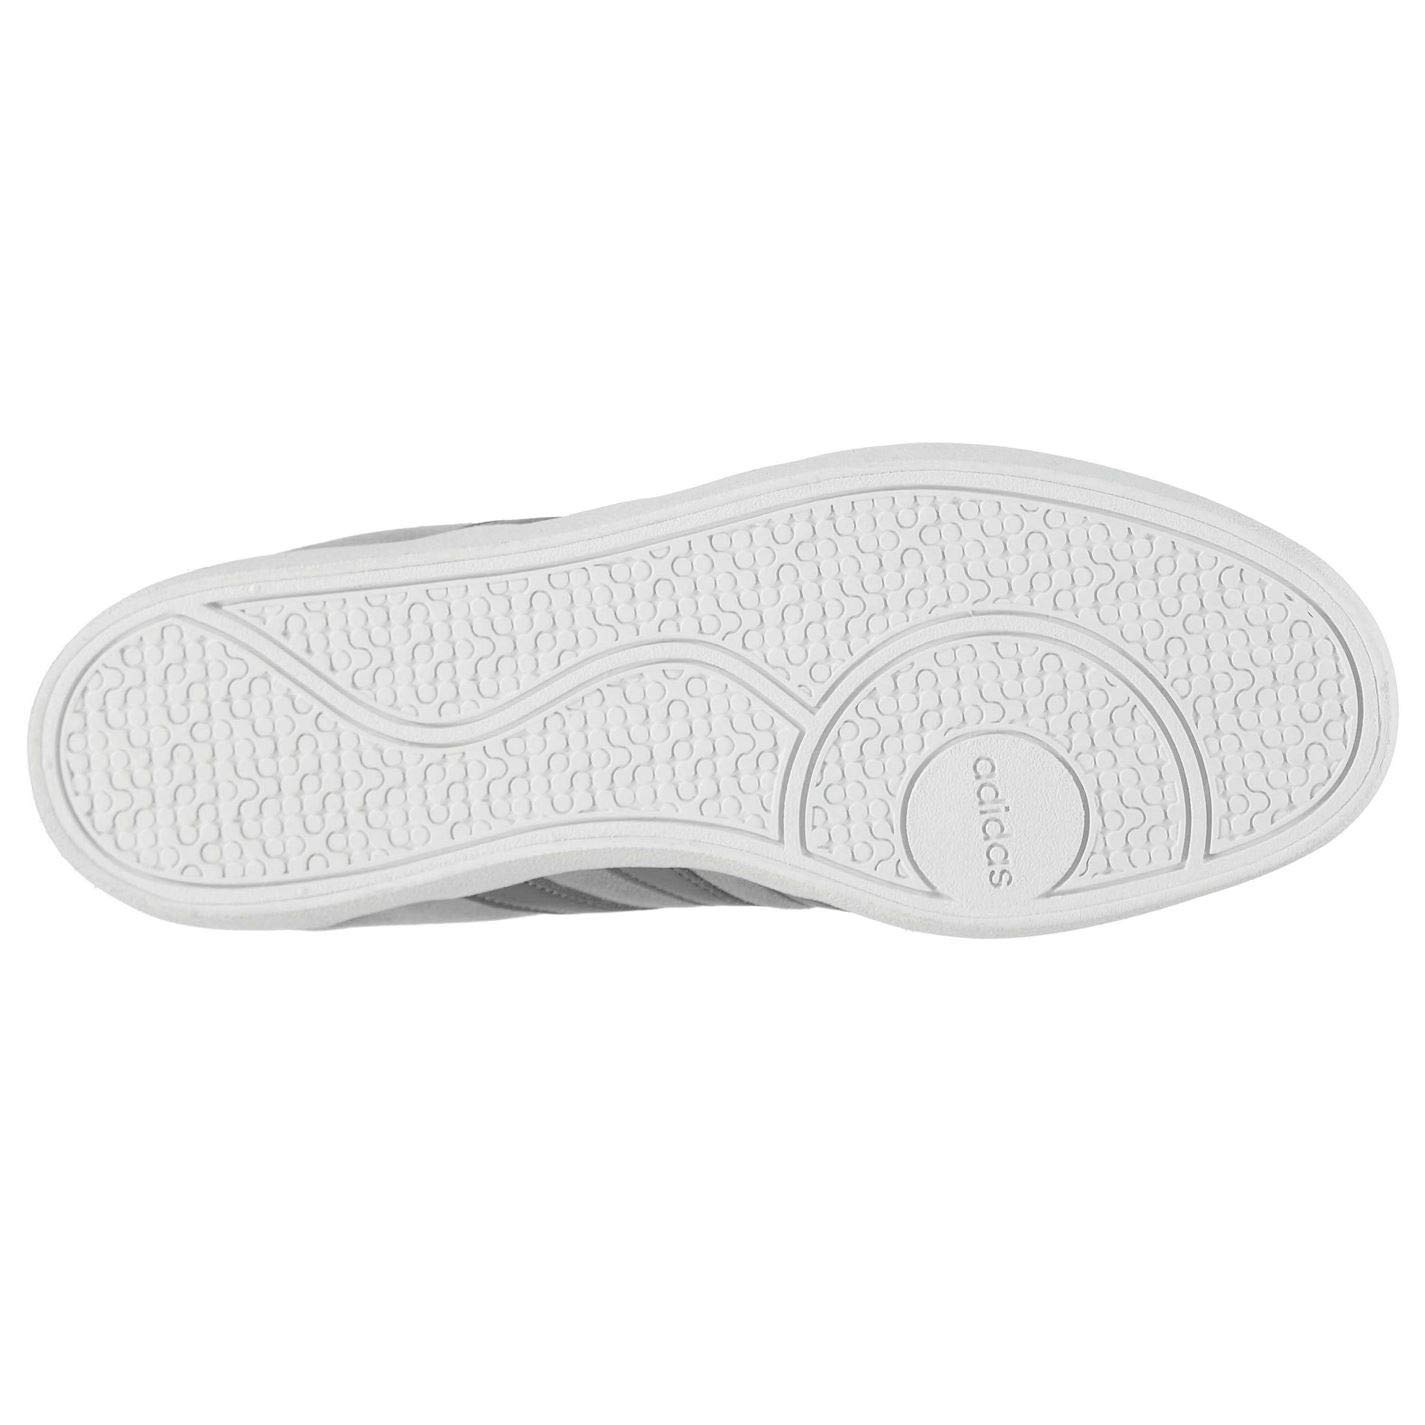 promo code d9051 2e90b adidas Men s Court Vulc Fitness Shoes  Amazon.co.uk  Shoes   Bags